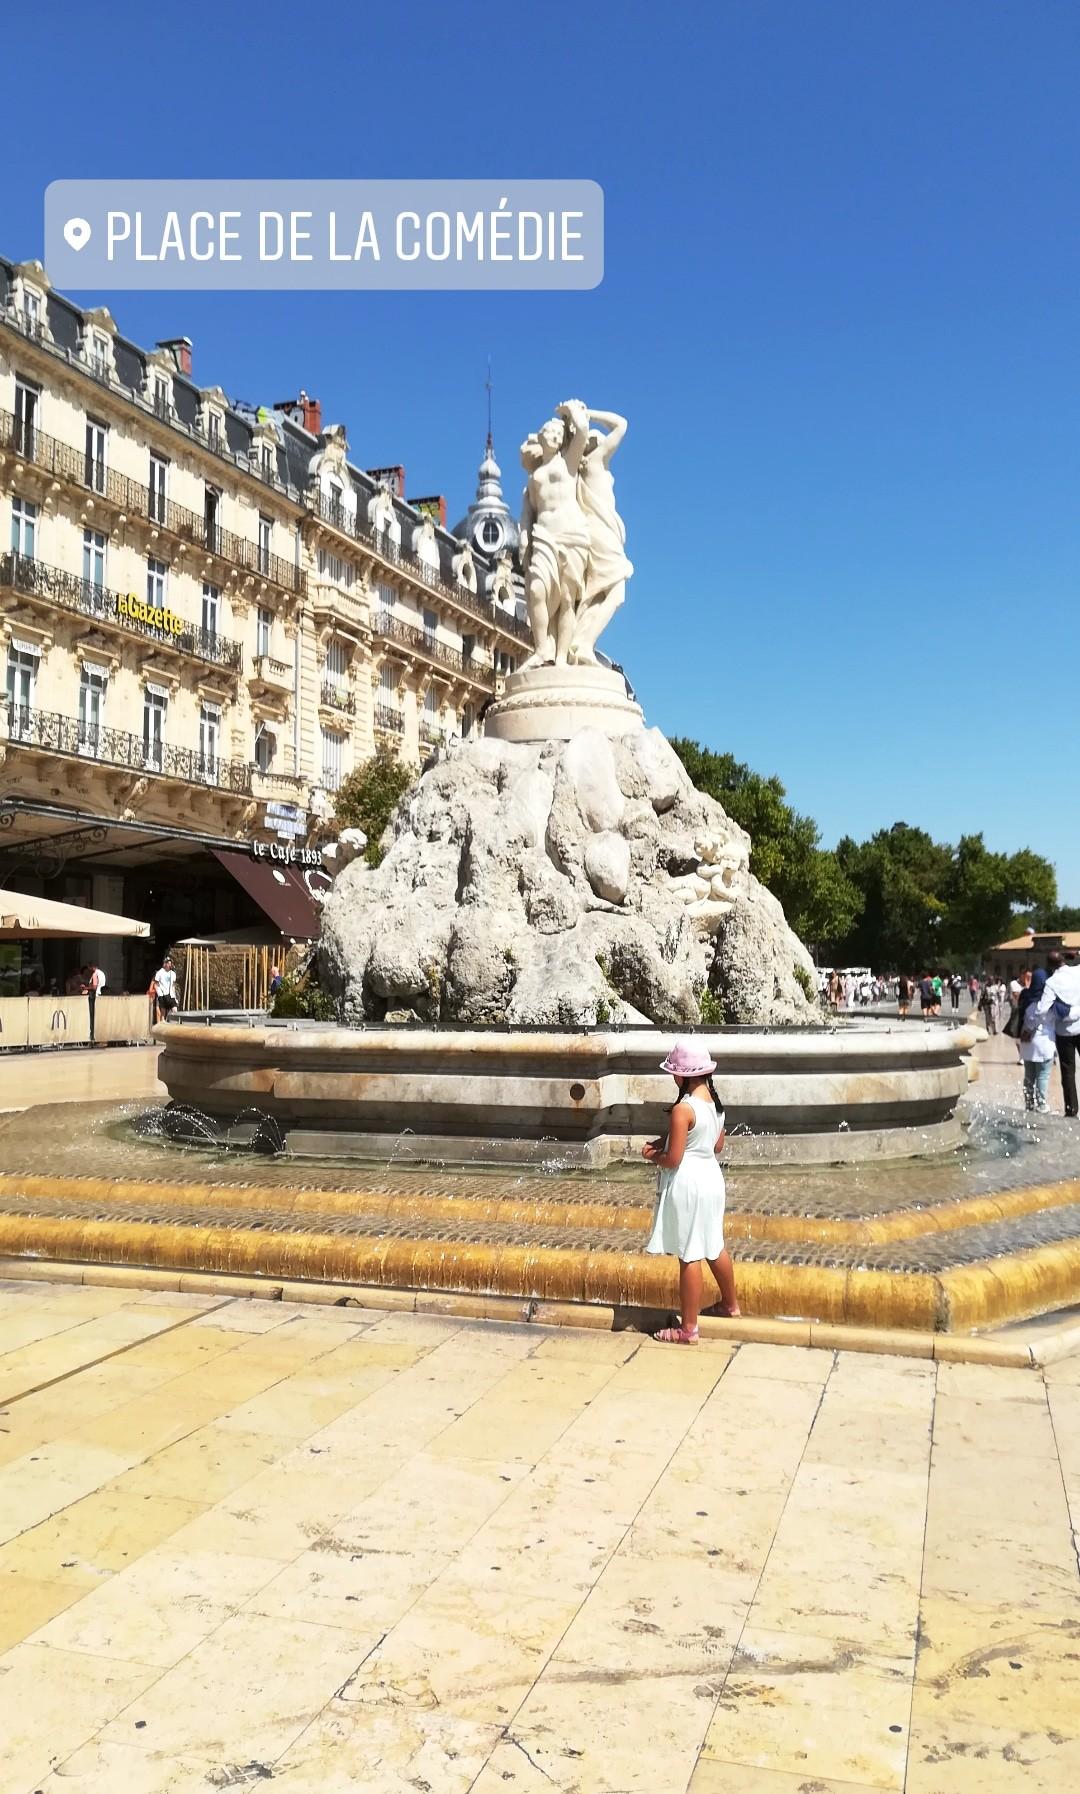 Pablo's Erasmus experience in Montpellier, France